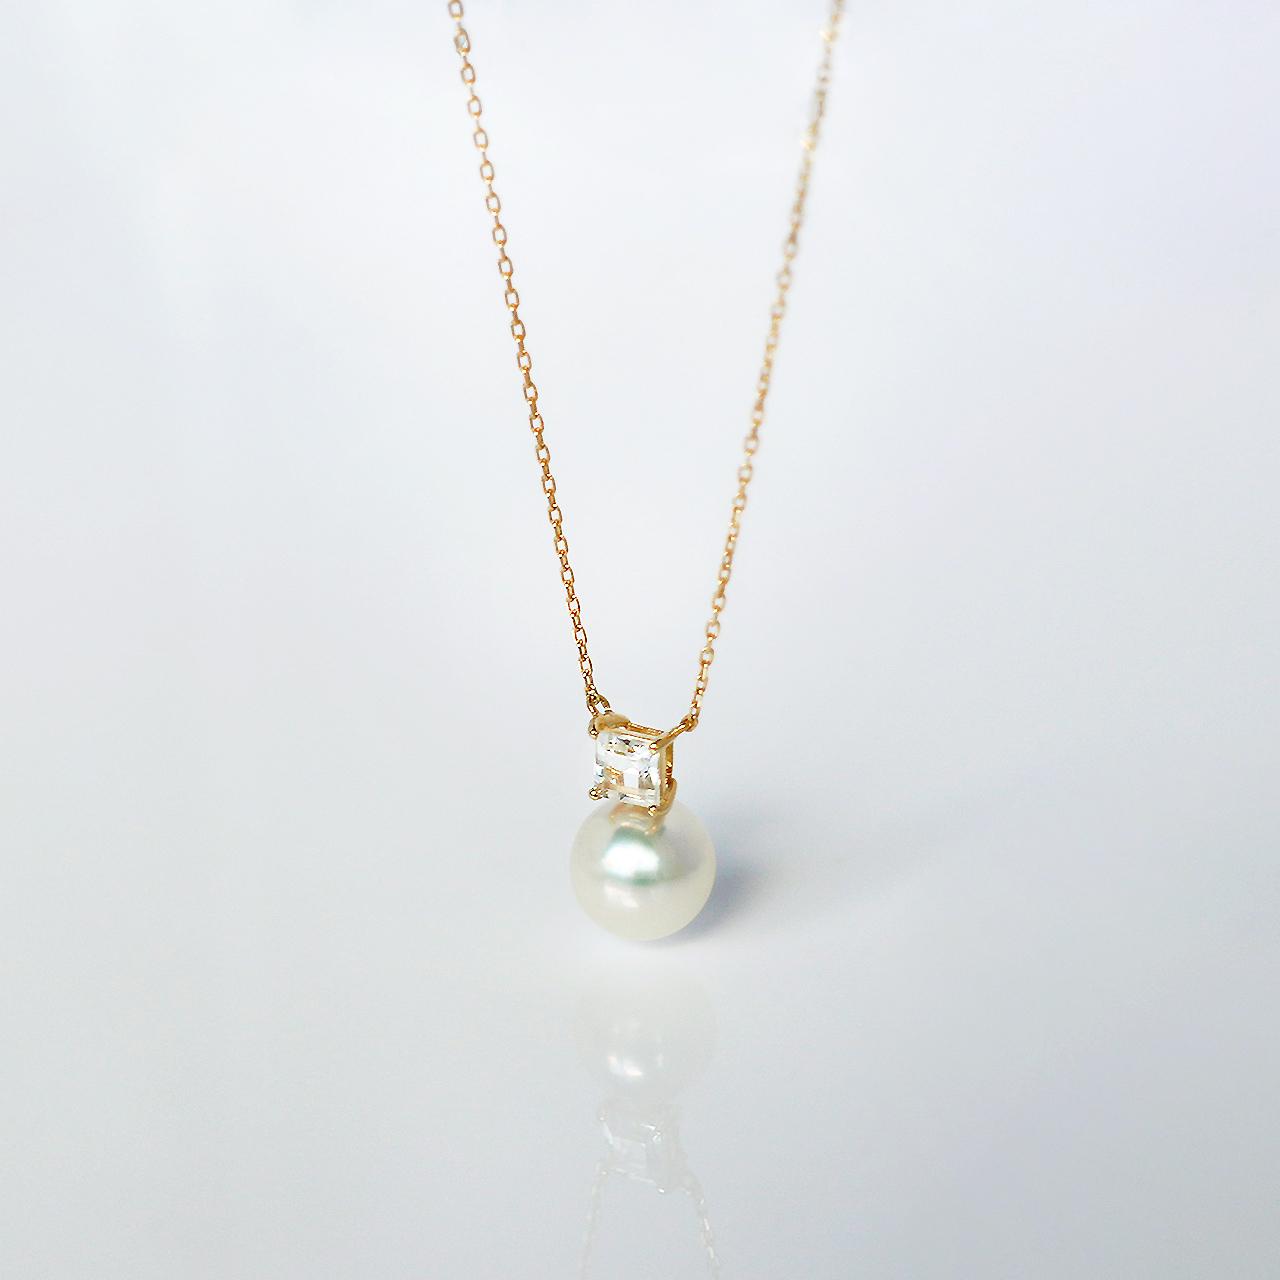 ELEMENTS / Necklace (White)